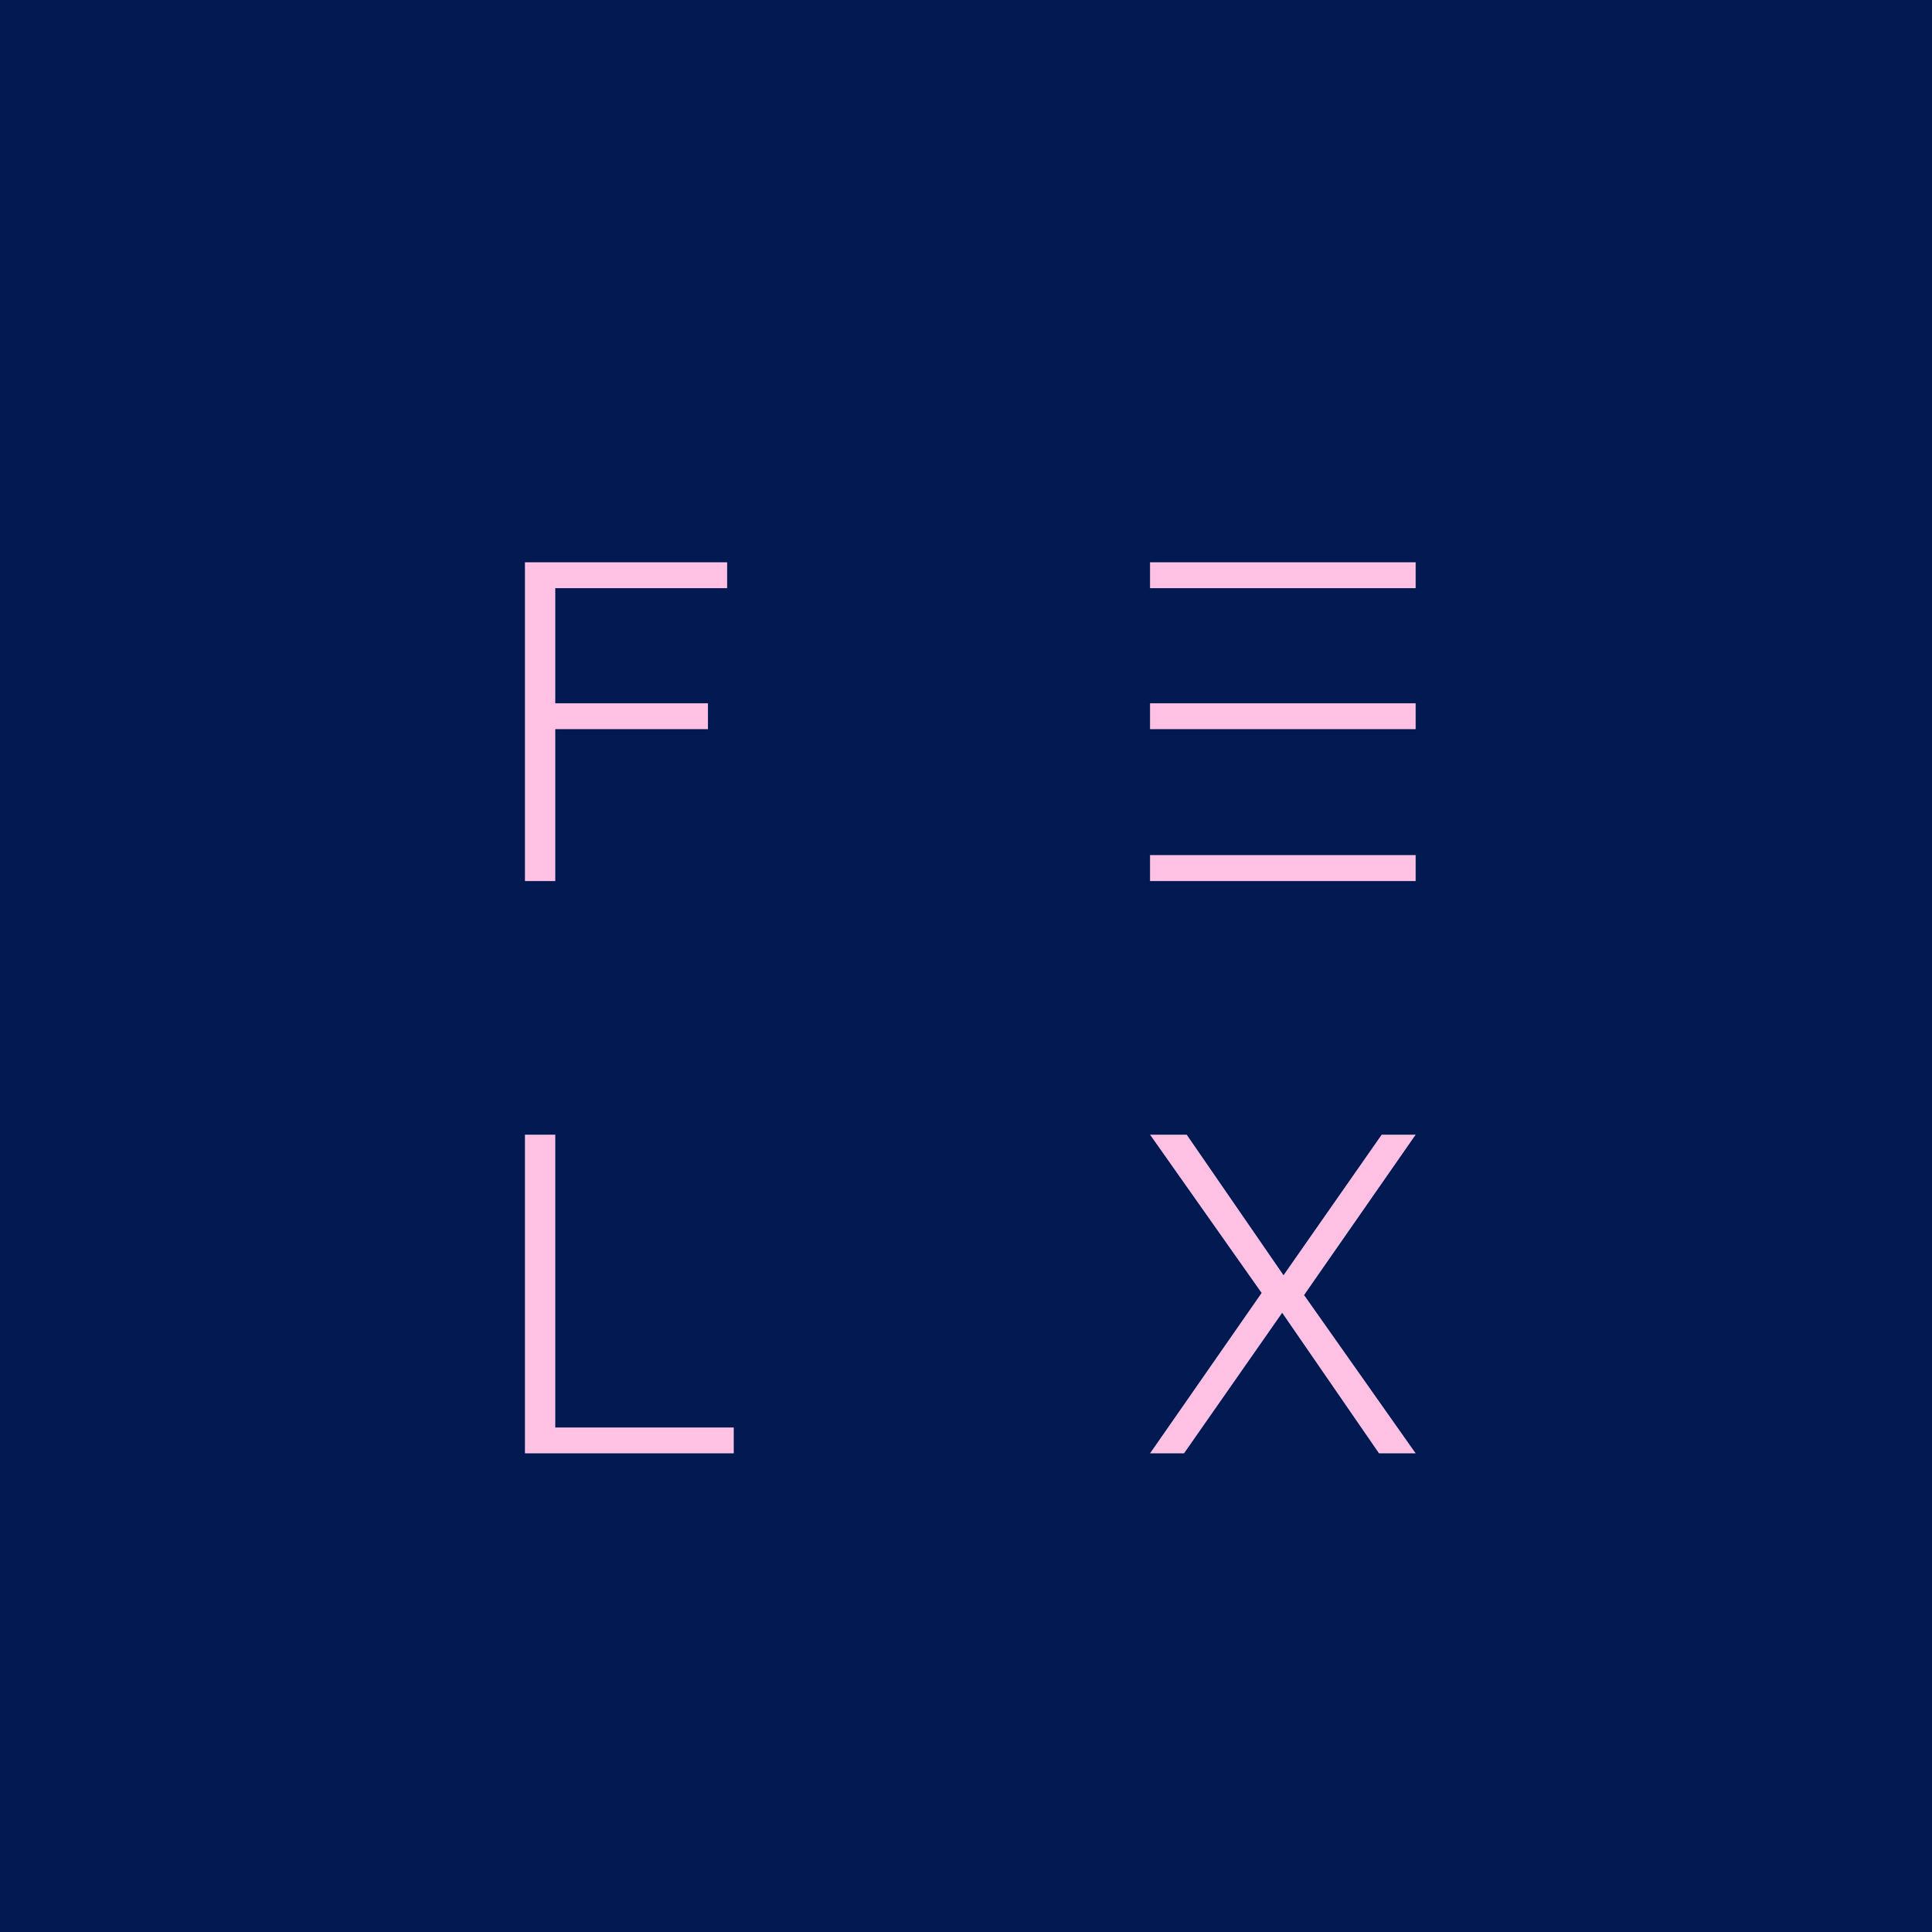 Flex_Instagram_Content-01.jpg